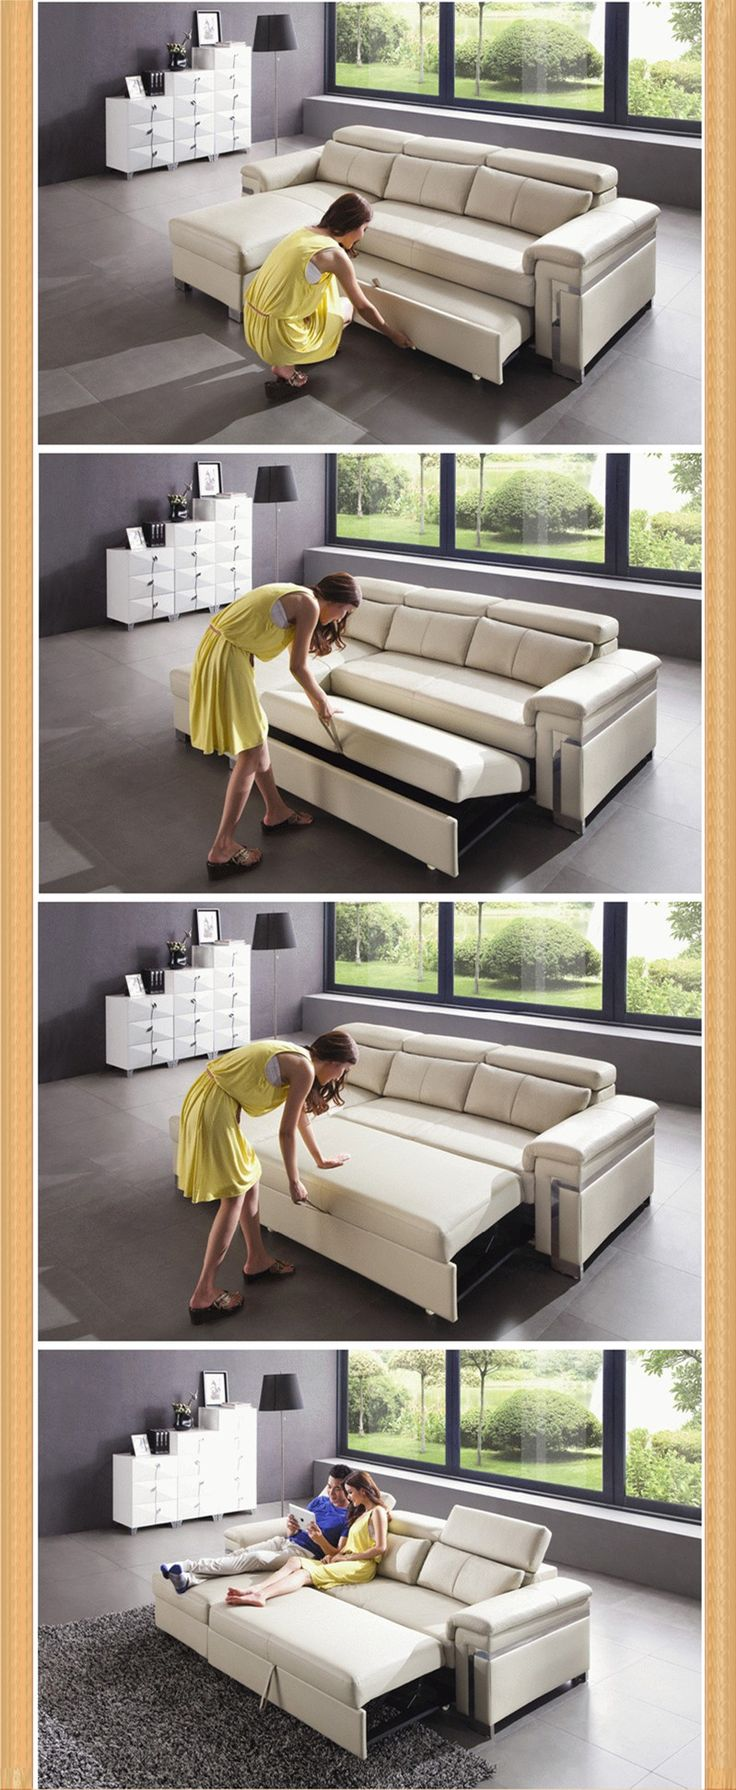 sleeper couch mechanism